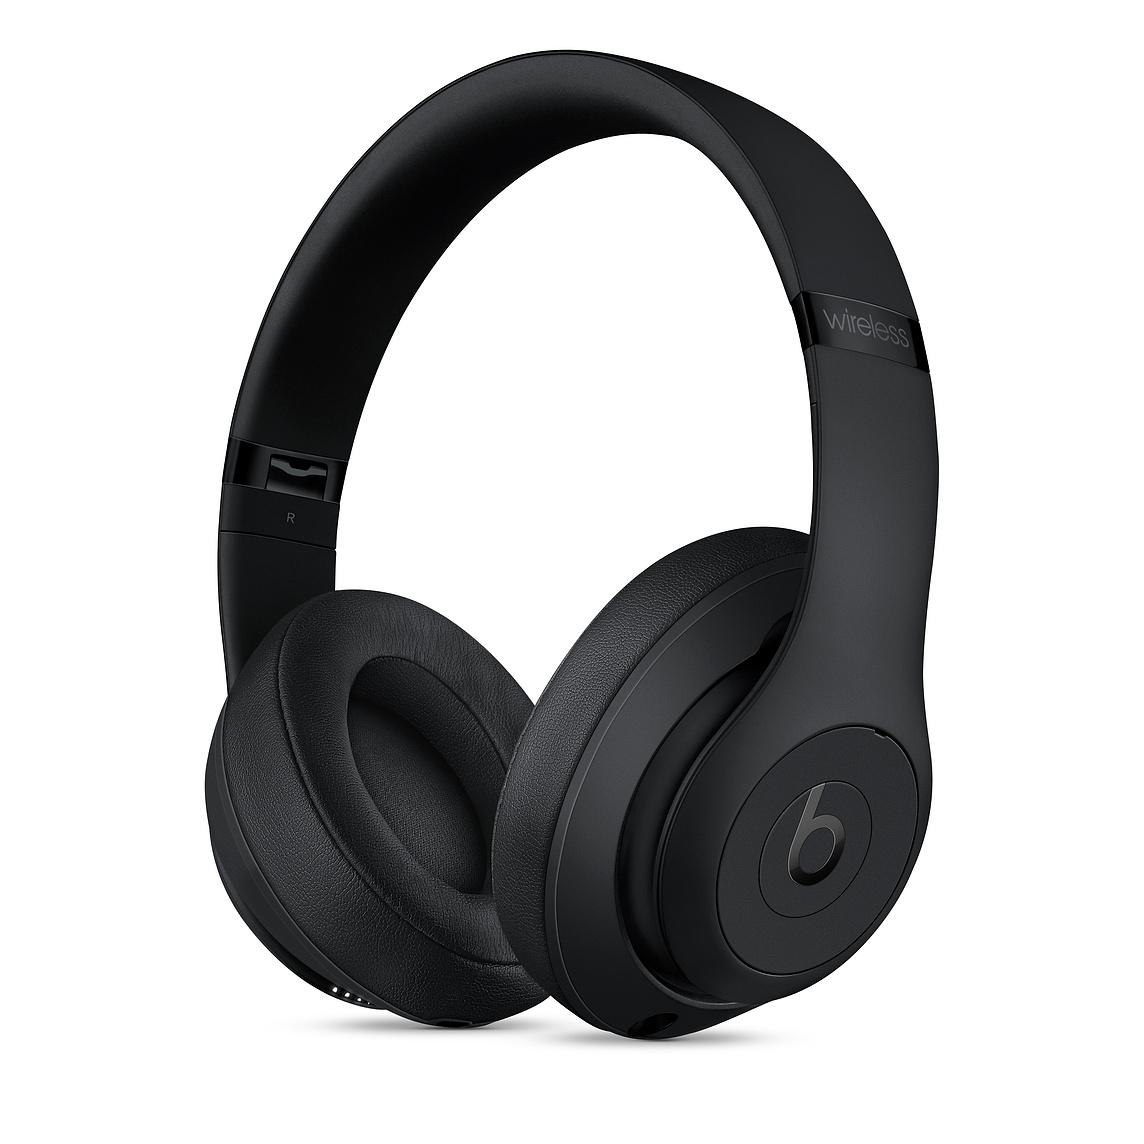 Apple Beats Studio3 무선 오버이어 헤드폰, 매트 블랙, MX3X2PA/A